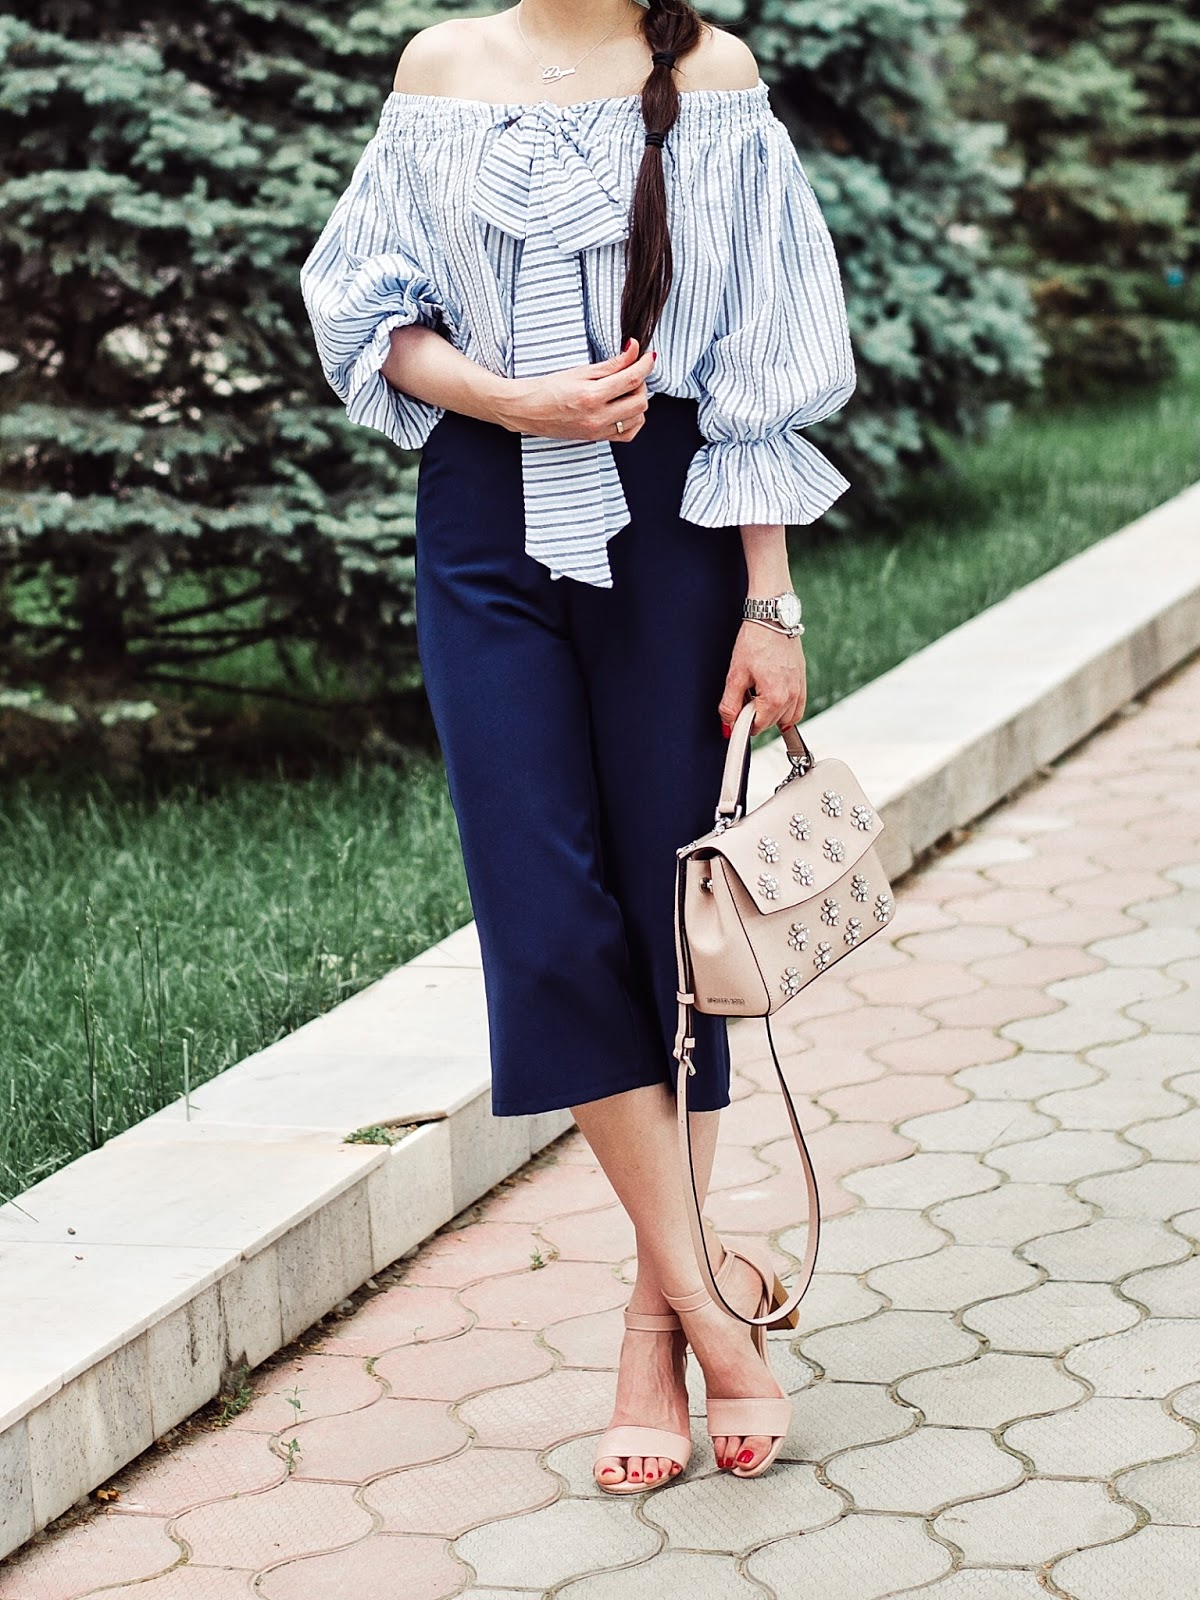 fashion blogger diyorasnotes diyora beta off shoulders top stripped top culottes rink sandals michael kors bag